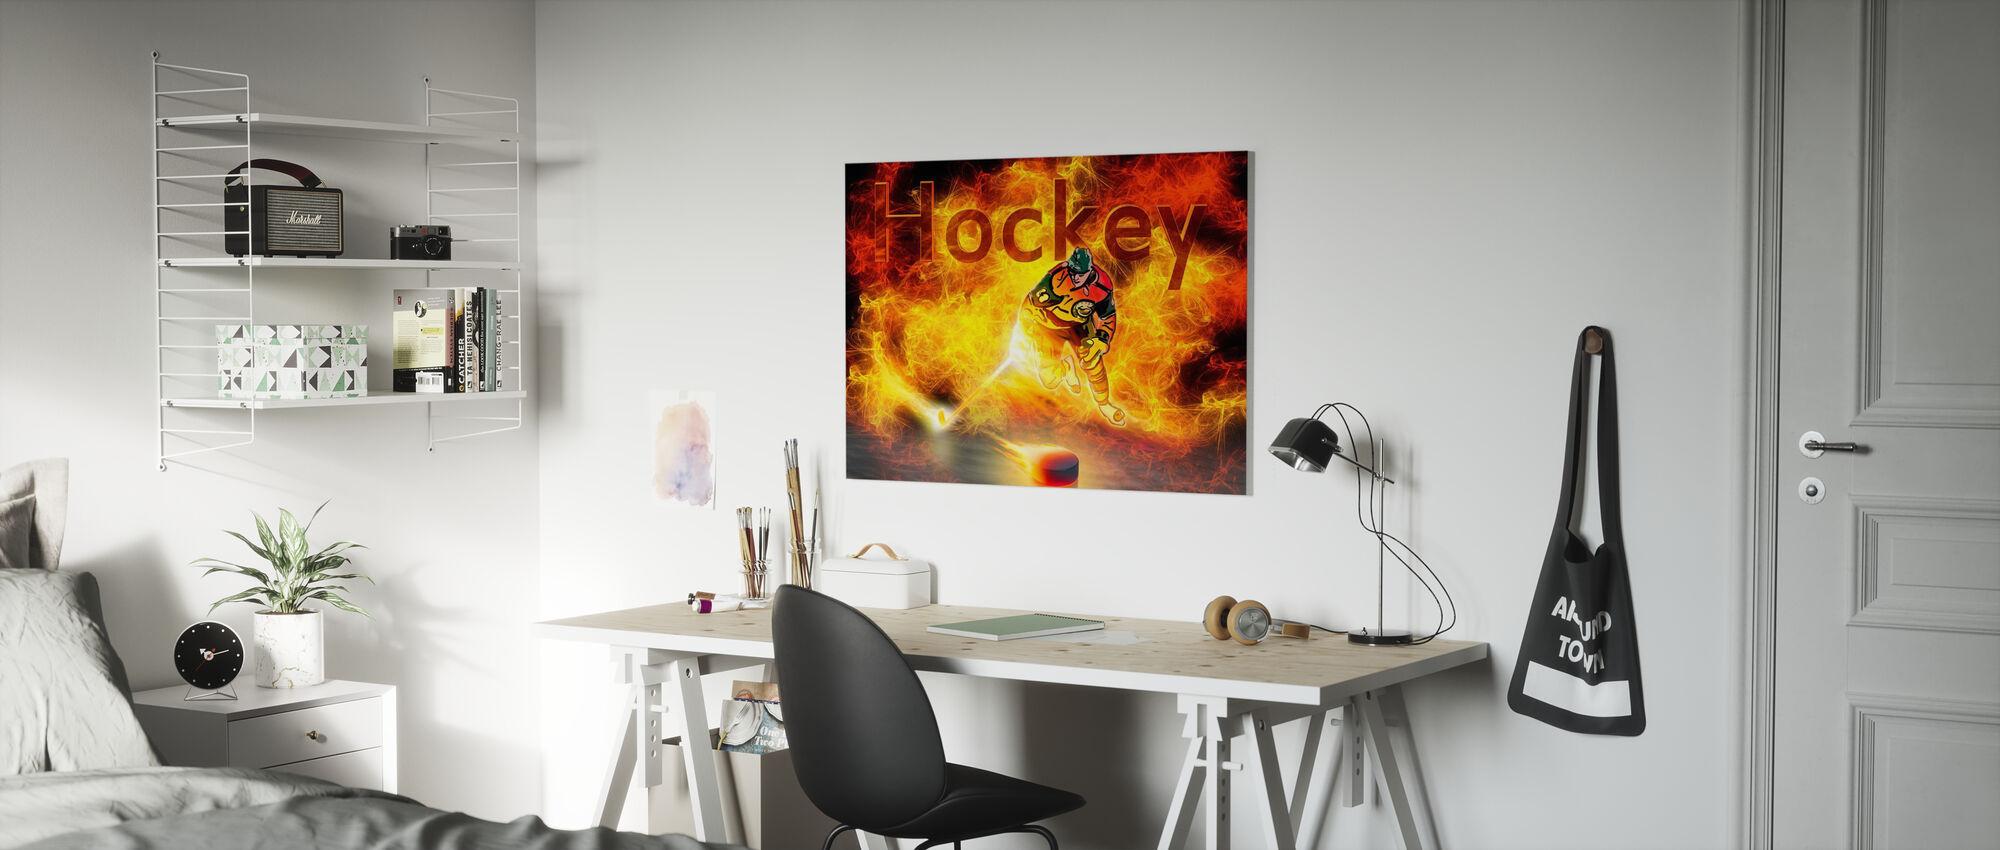 Hockeywärme - Leinwandbild - Kinderzimmer